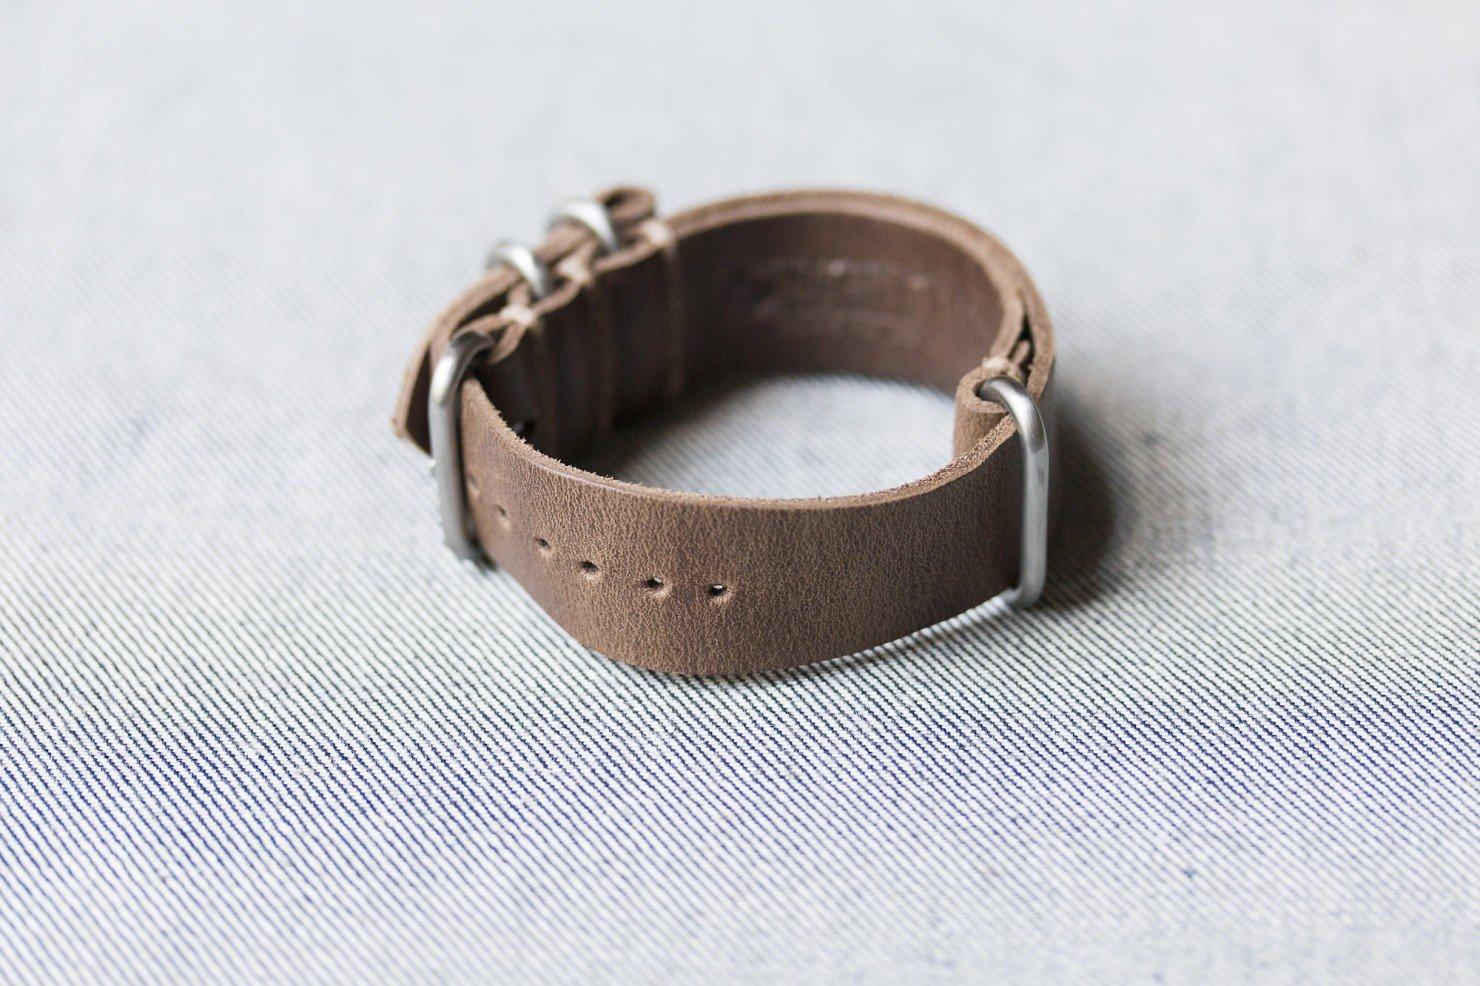 Military Watch Strap by Worn & Wound 2